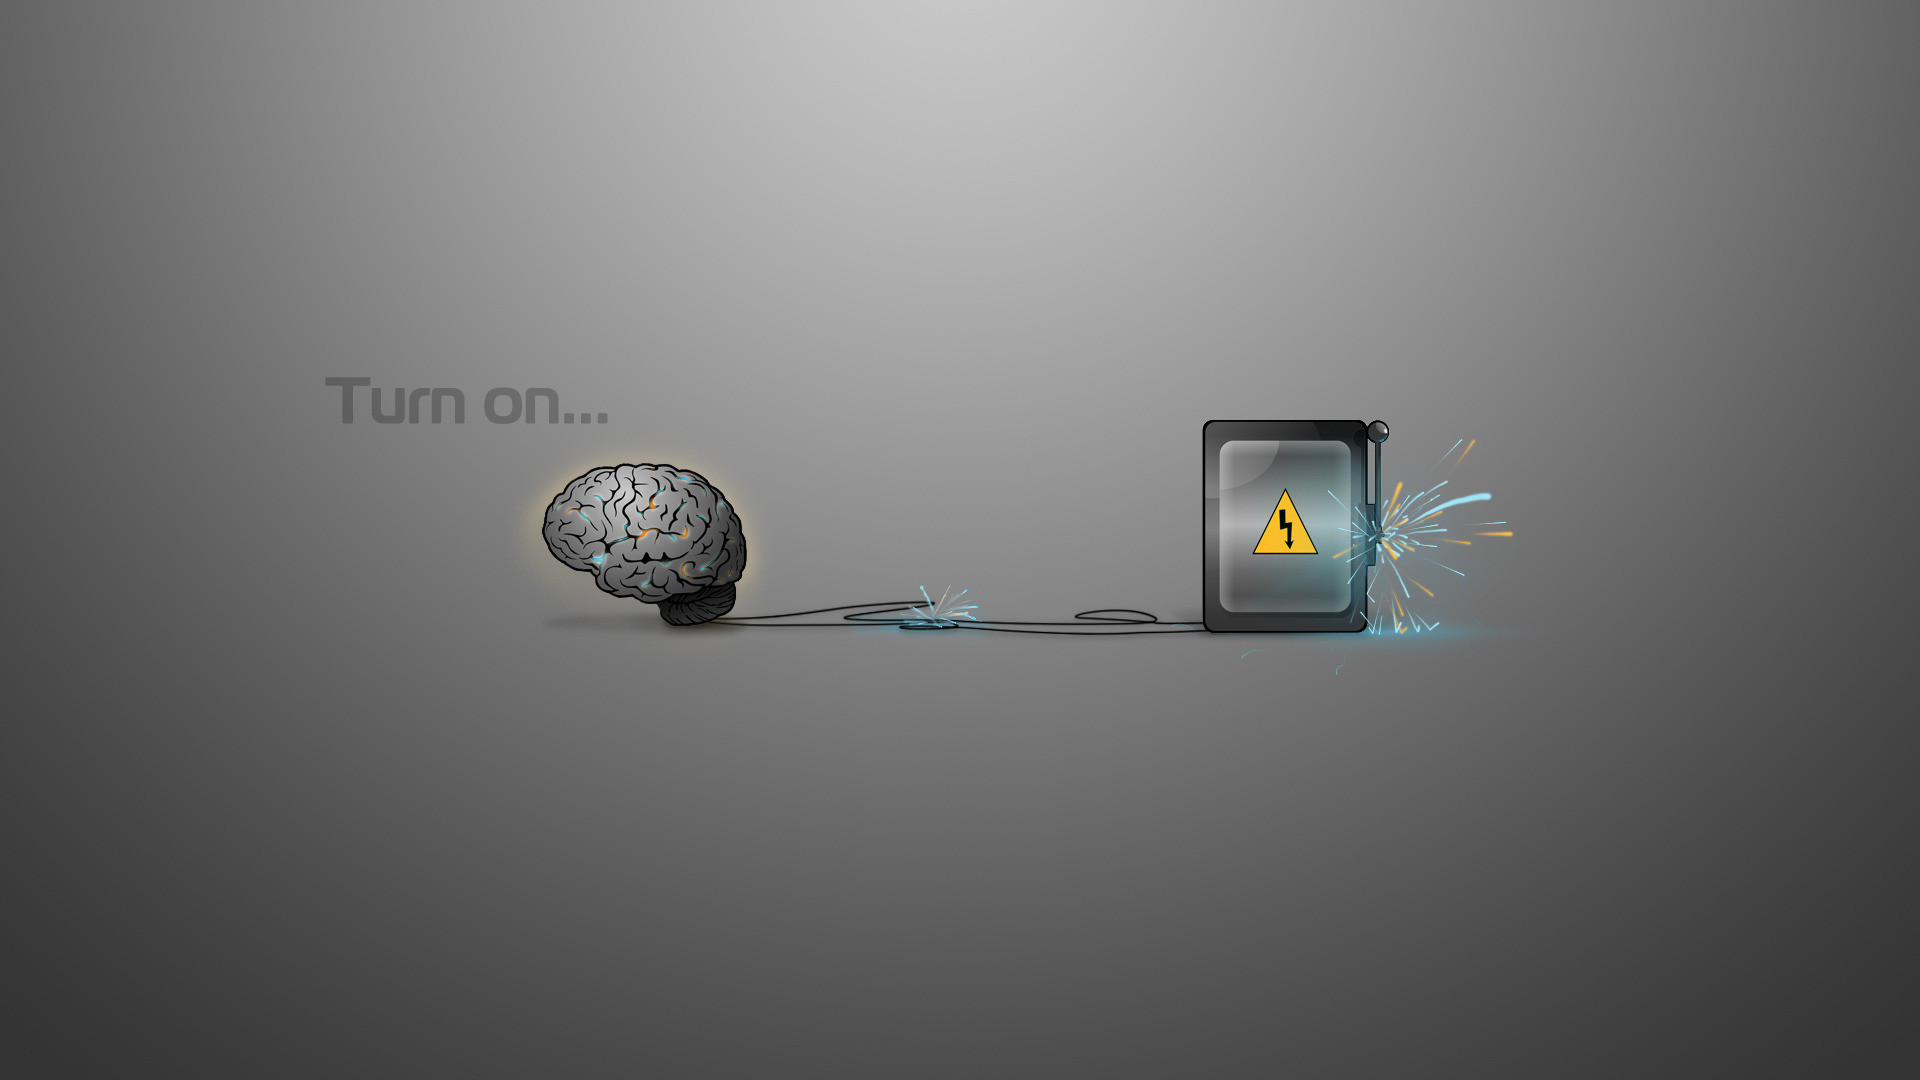 Misc – Motivational Brain Electricity Wallpaper